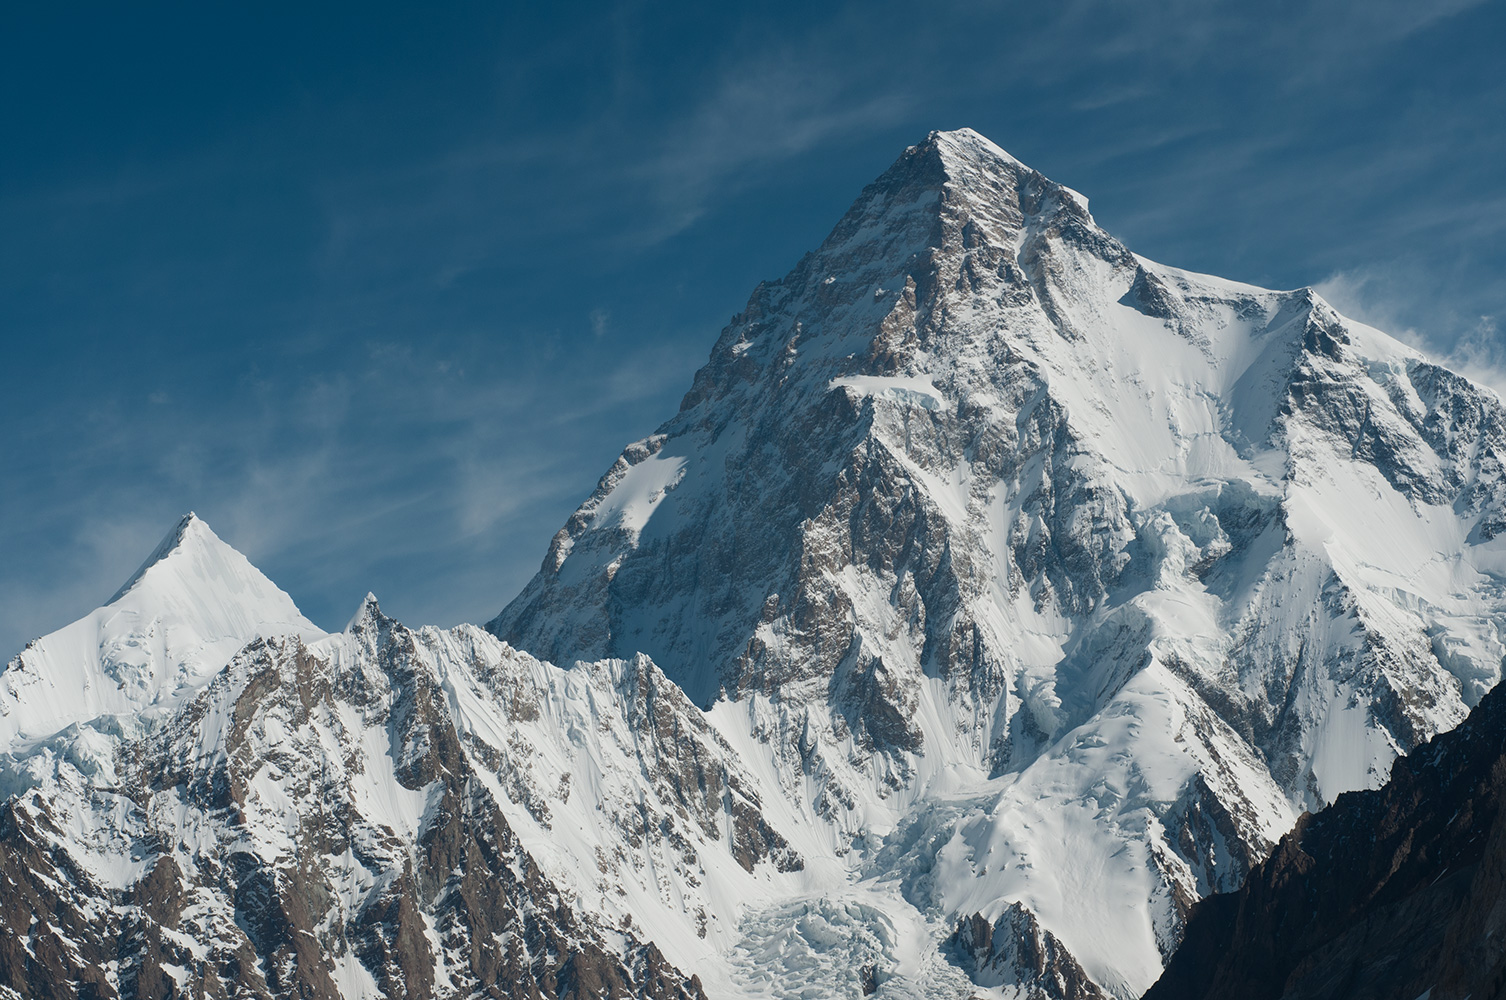 From the Godwin Austen glacier near Broad Peak base campNikon D300, 60mm